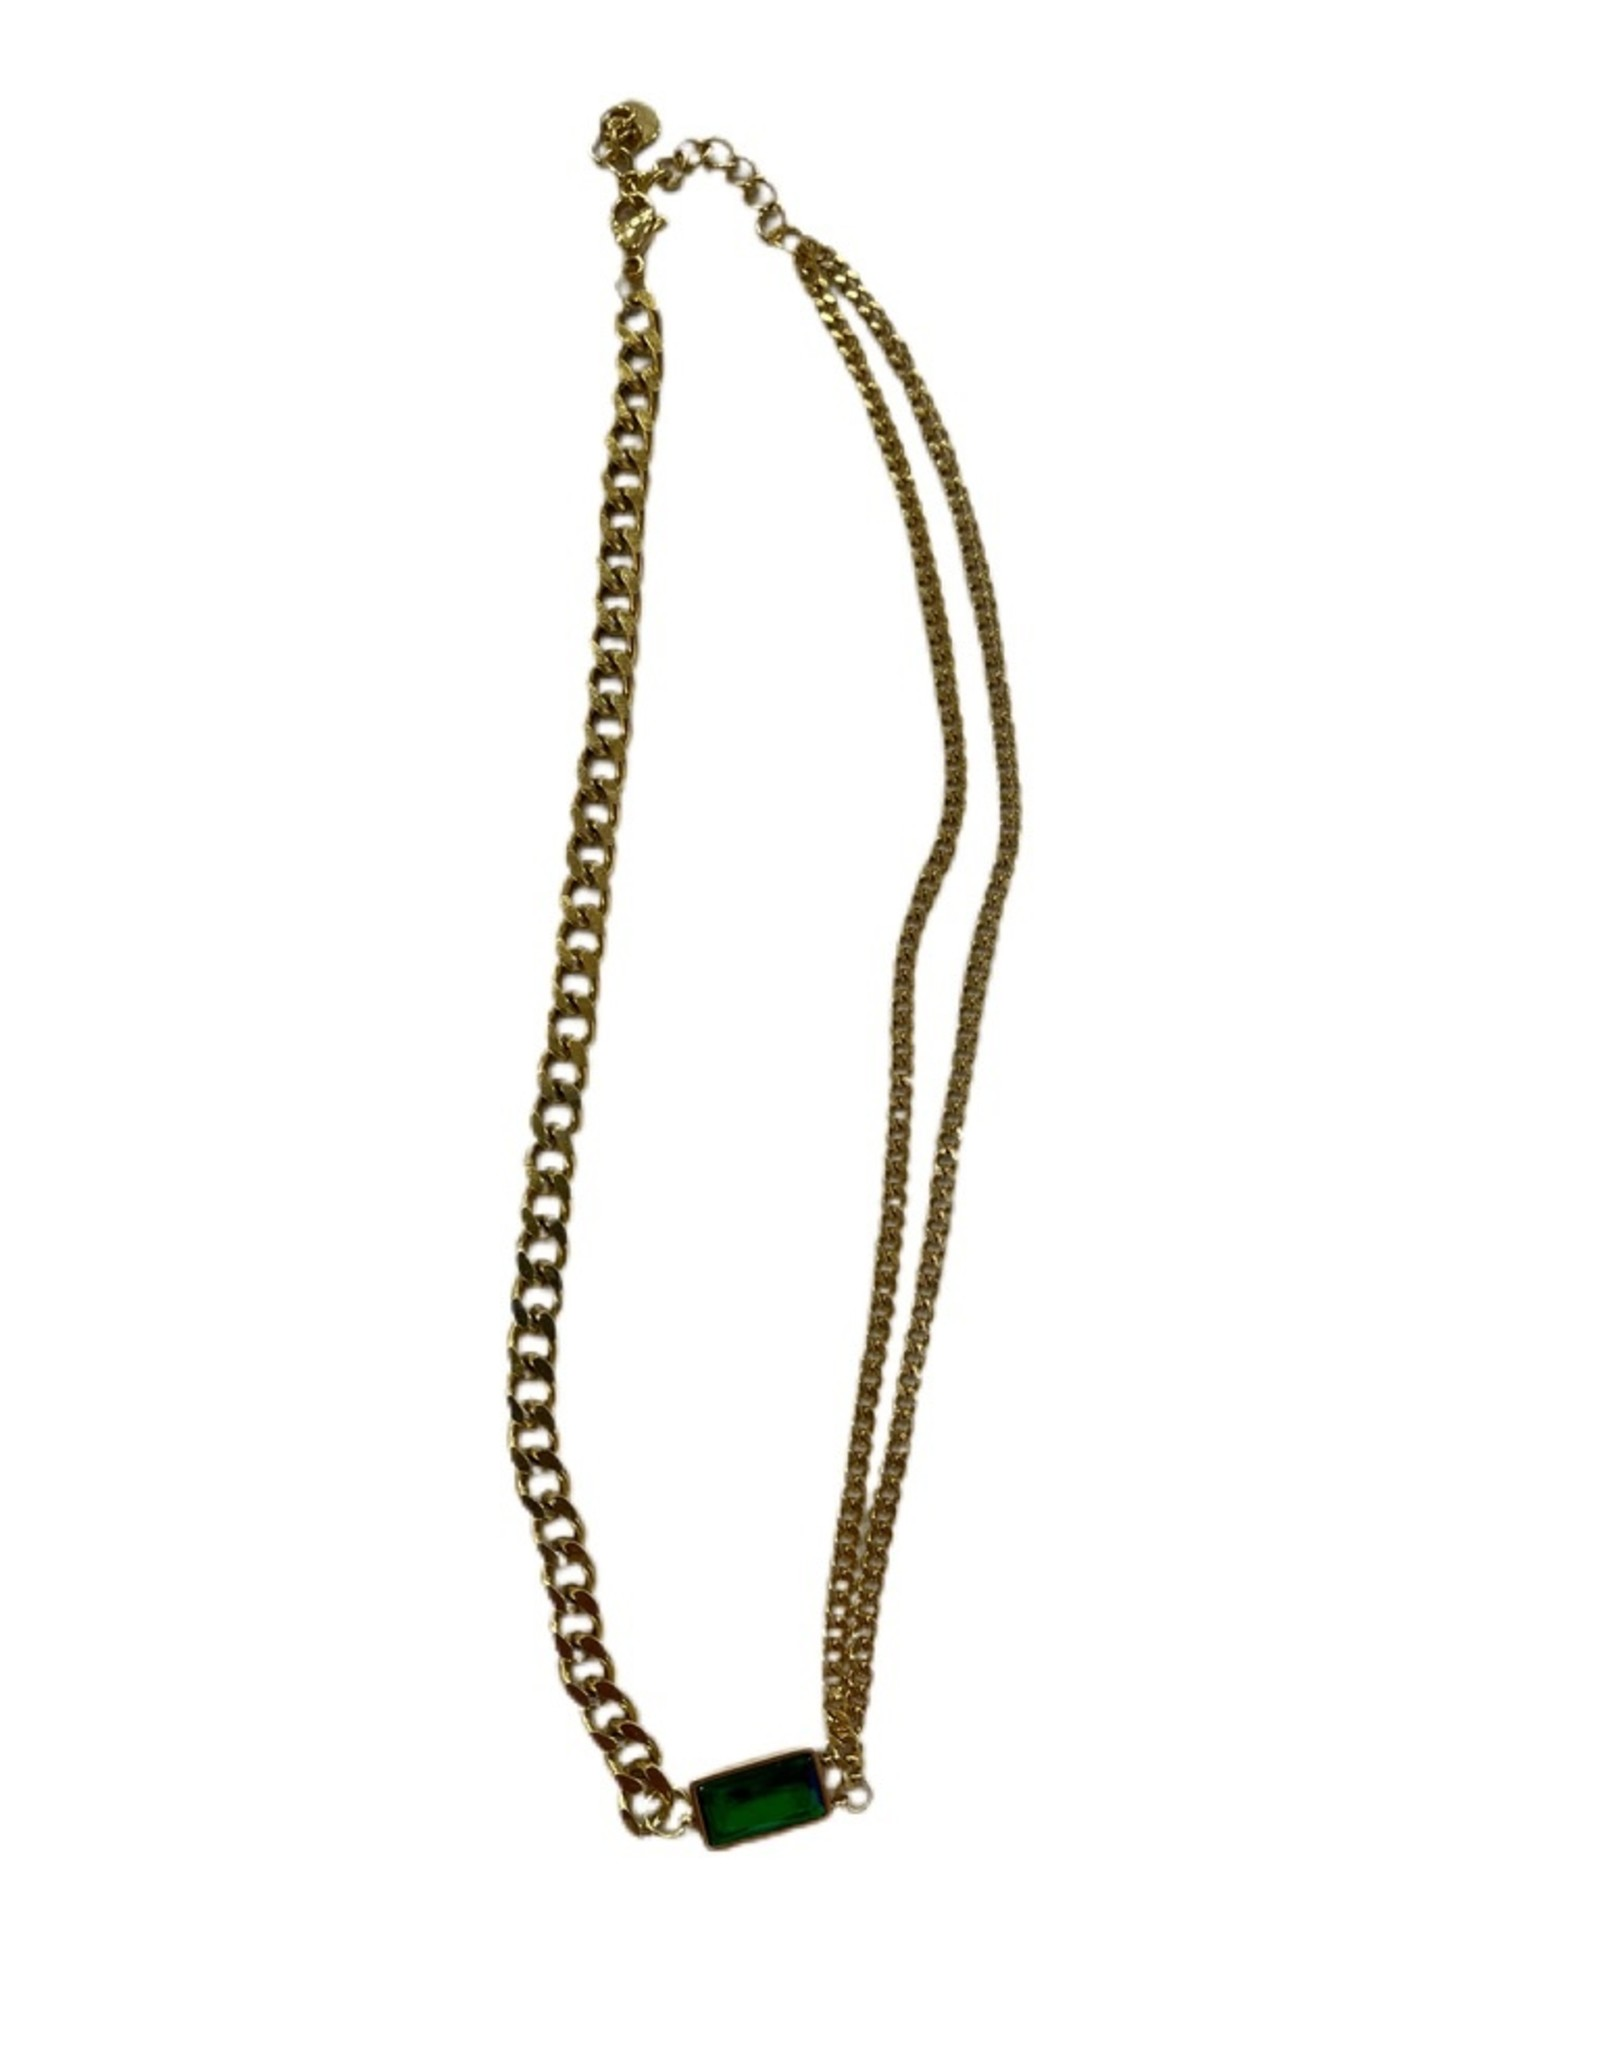 Wyld Blue Emerald Pendant Necklace